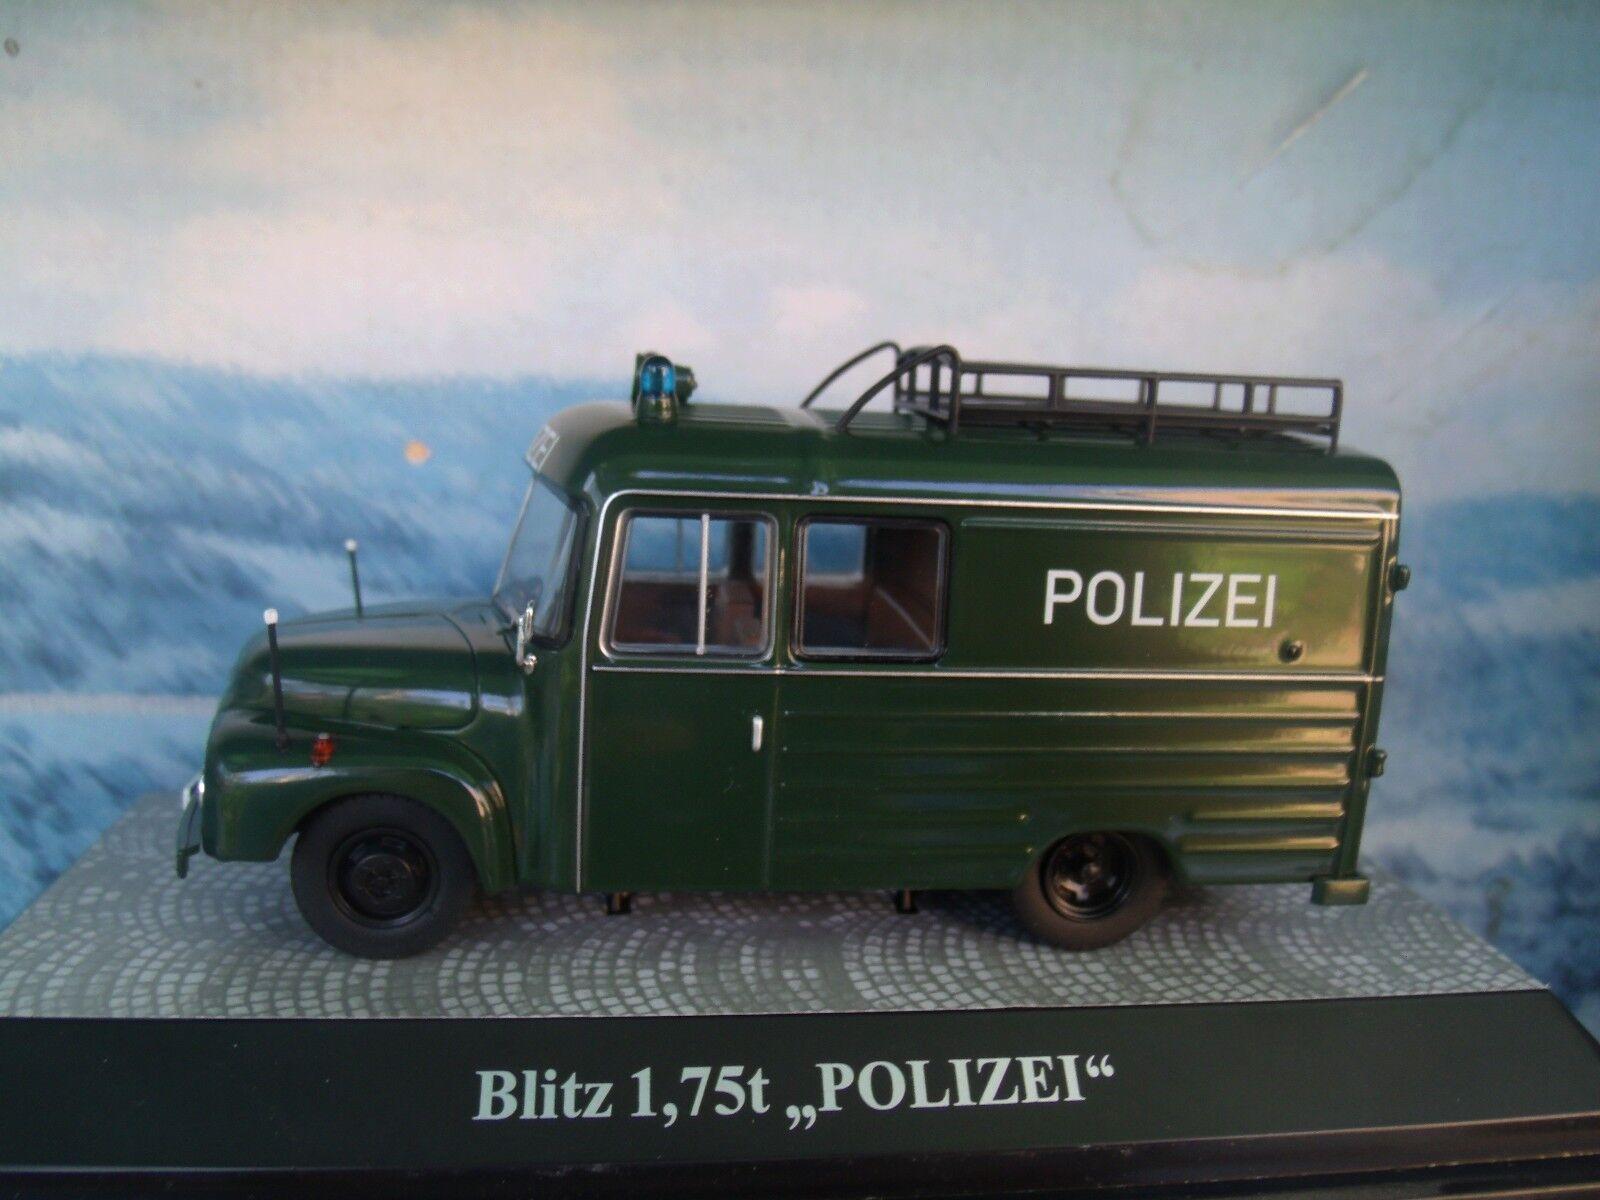 1 43 Premium ClassiXXs Opel Blitz 1,75 T POLICE Limited 1 of 500